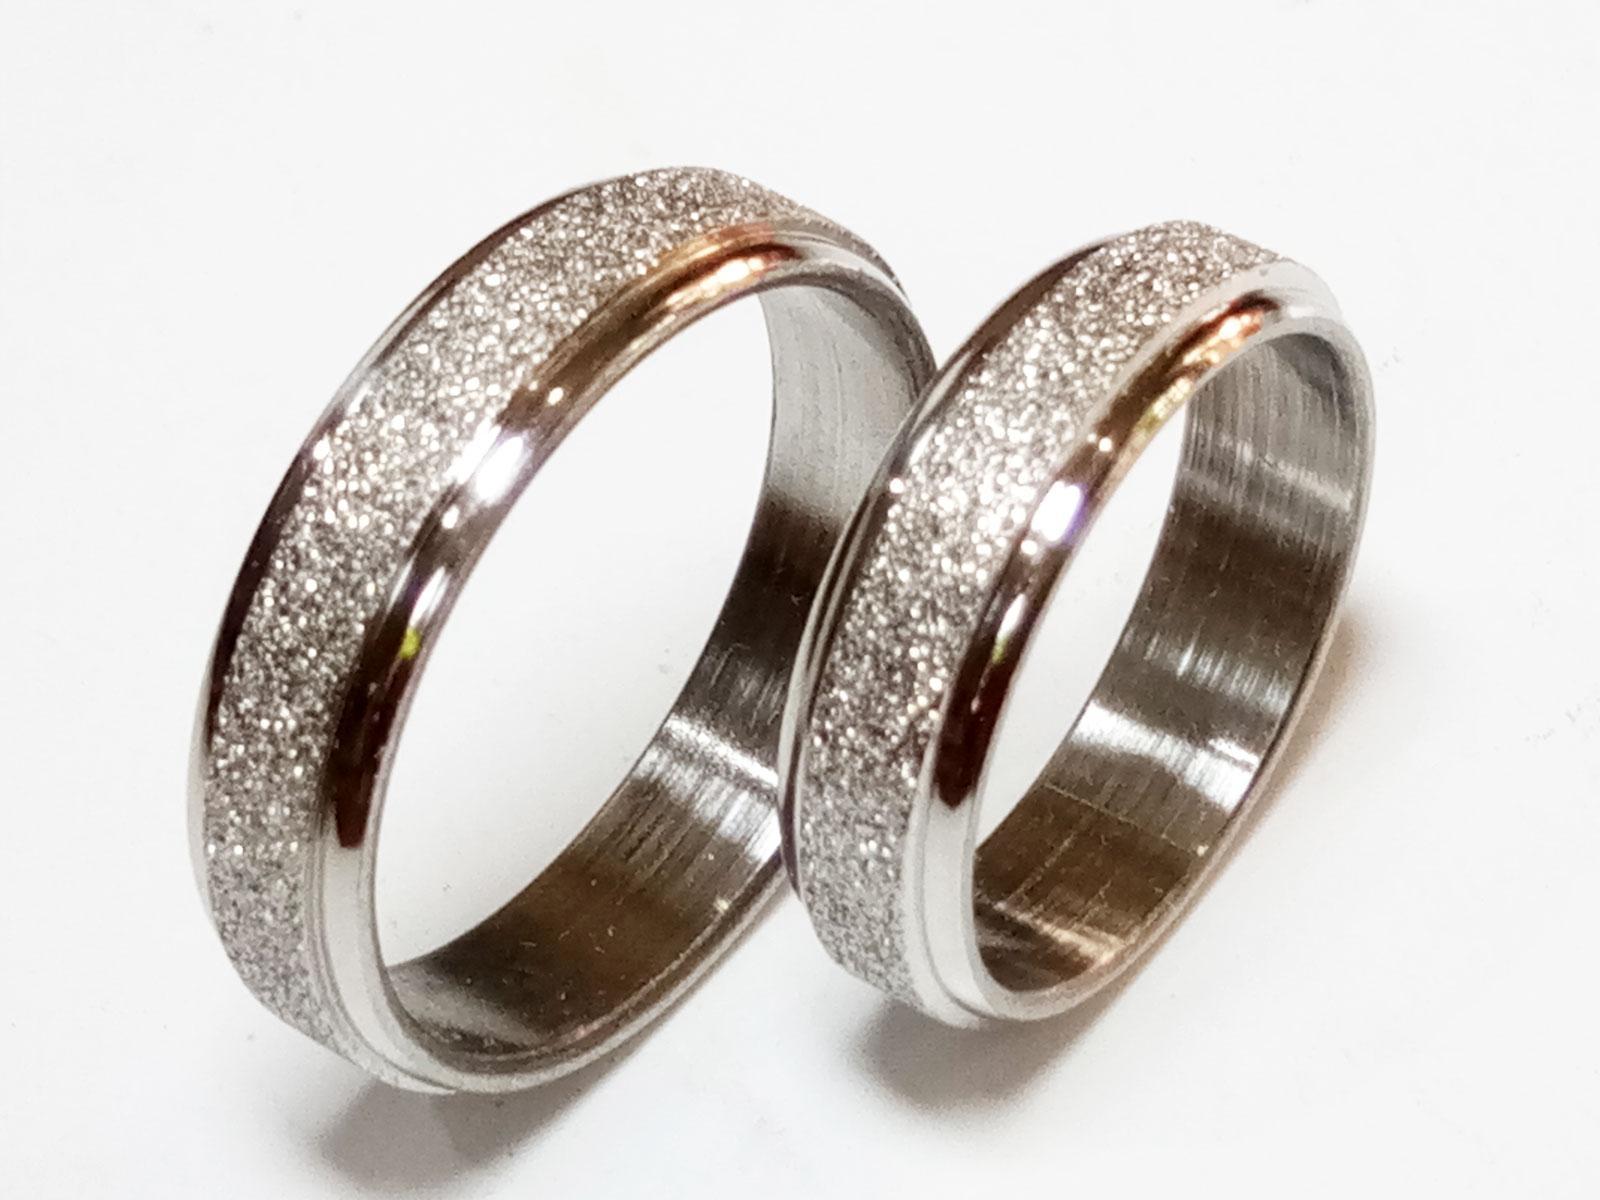 VeE Cincin Single / Couple / Pasangan untuk Tunangan / Nikahan Titanium Stainless Steel Silver Pasir M1